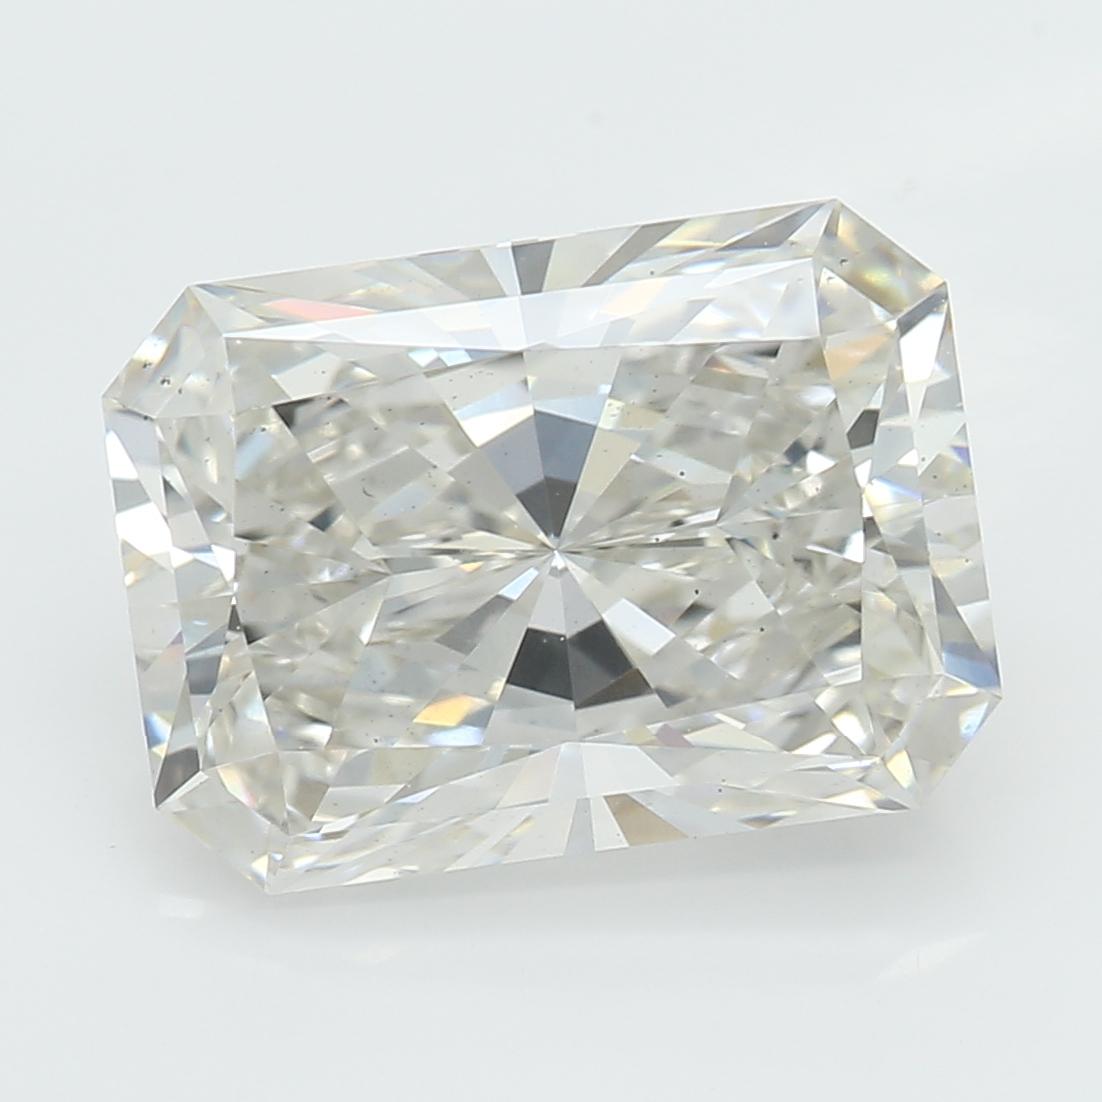 2.48 Carat I-VS2 Excellent Radiant Diamond